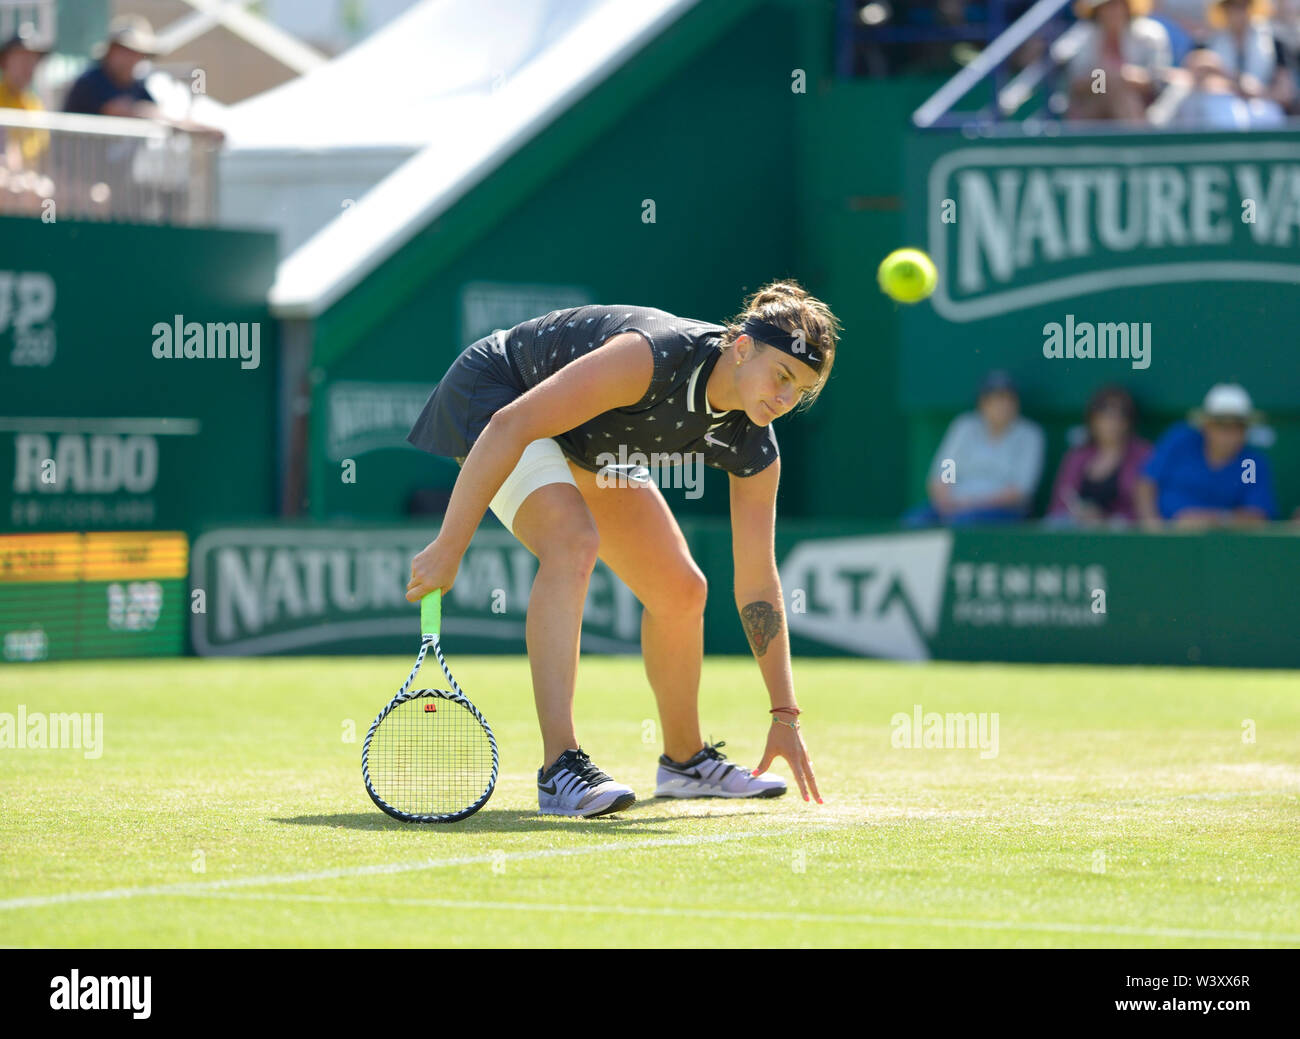 Aryna Sabalenka (Belarus) playing on centre court at the Nature Valley International, Devonshire Park, Eastbourne, UK.  27th June 2019 - Stock Image